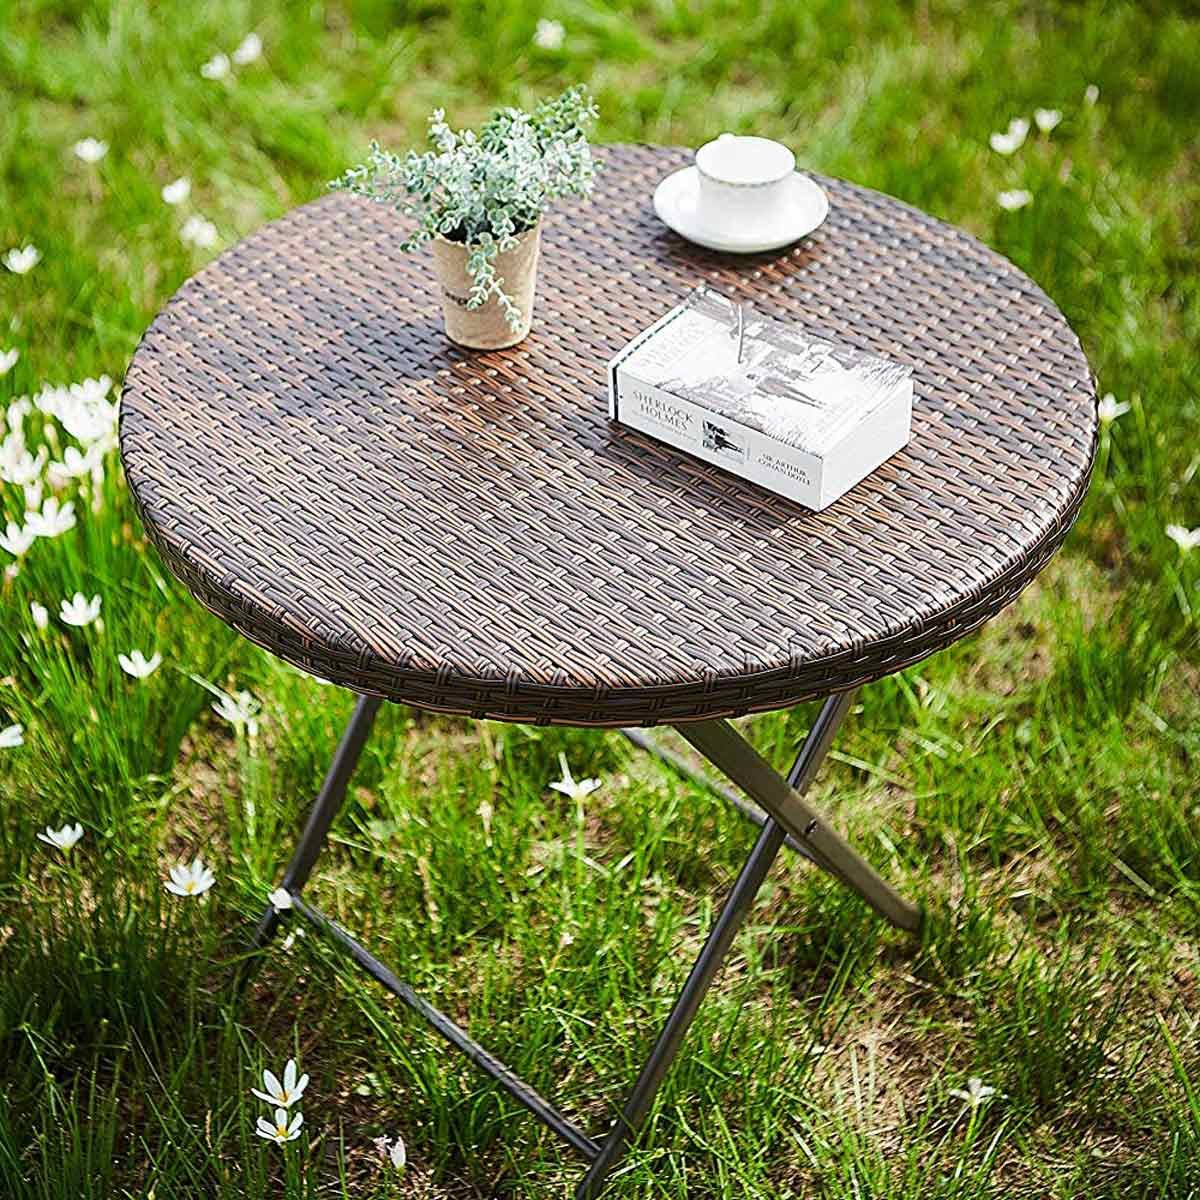 JIWU-Small-Outdoor-Rattan-Wicker-Folding-Picnic-Table-Patio-Porch-Bistro-Dining-Table